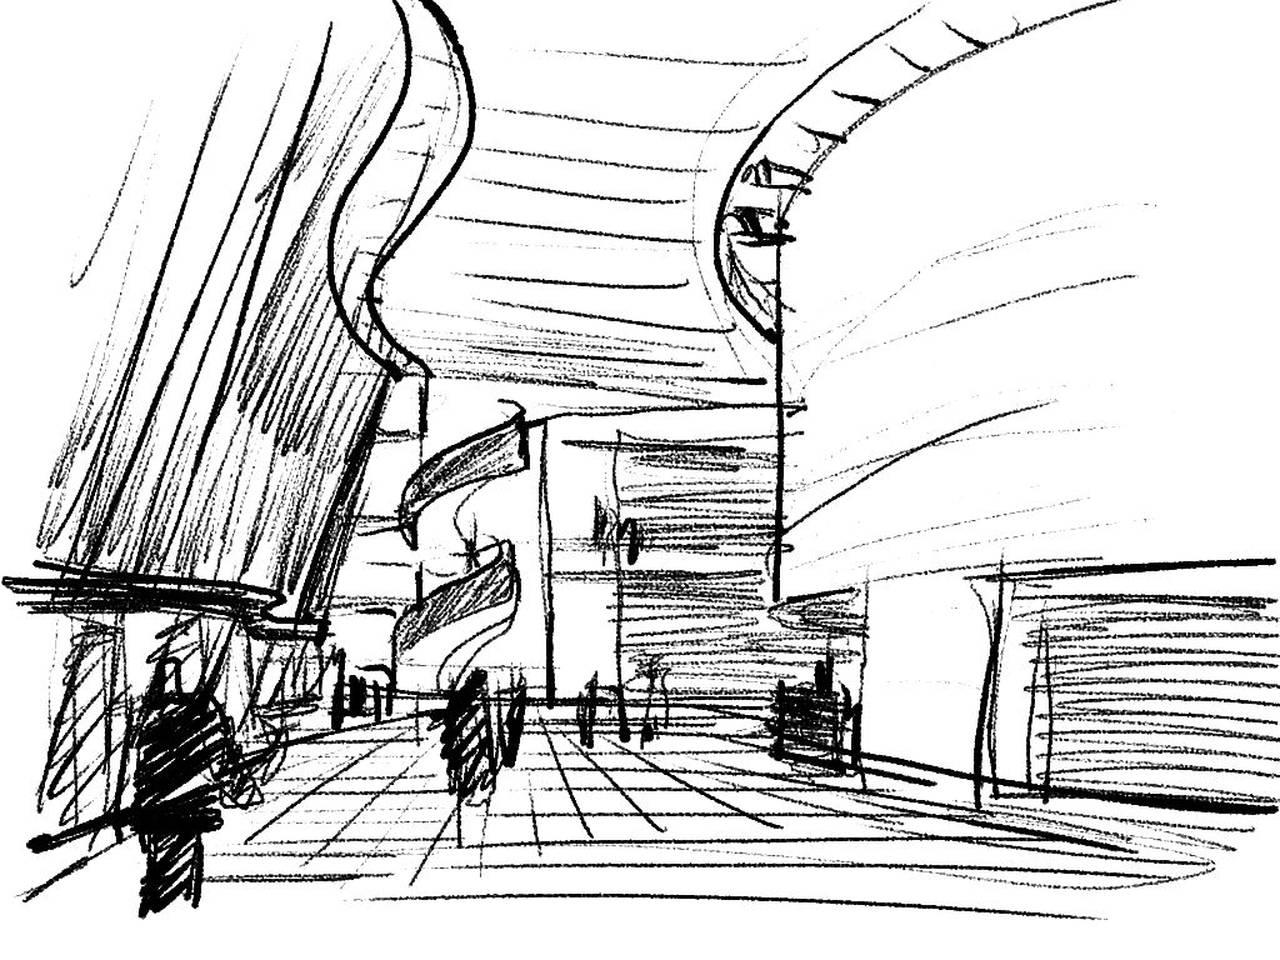 Centro Cultural Katuaq diseñado por Schmidt Hammer Lassen : Sketch © Schmidt Hammer Lassen Architects